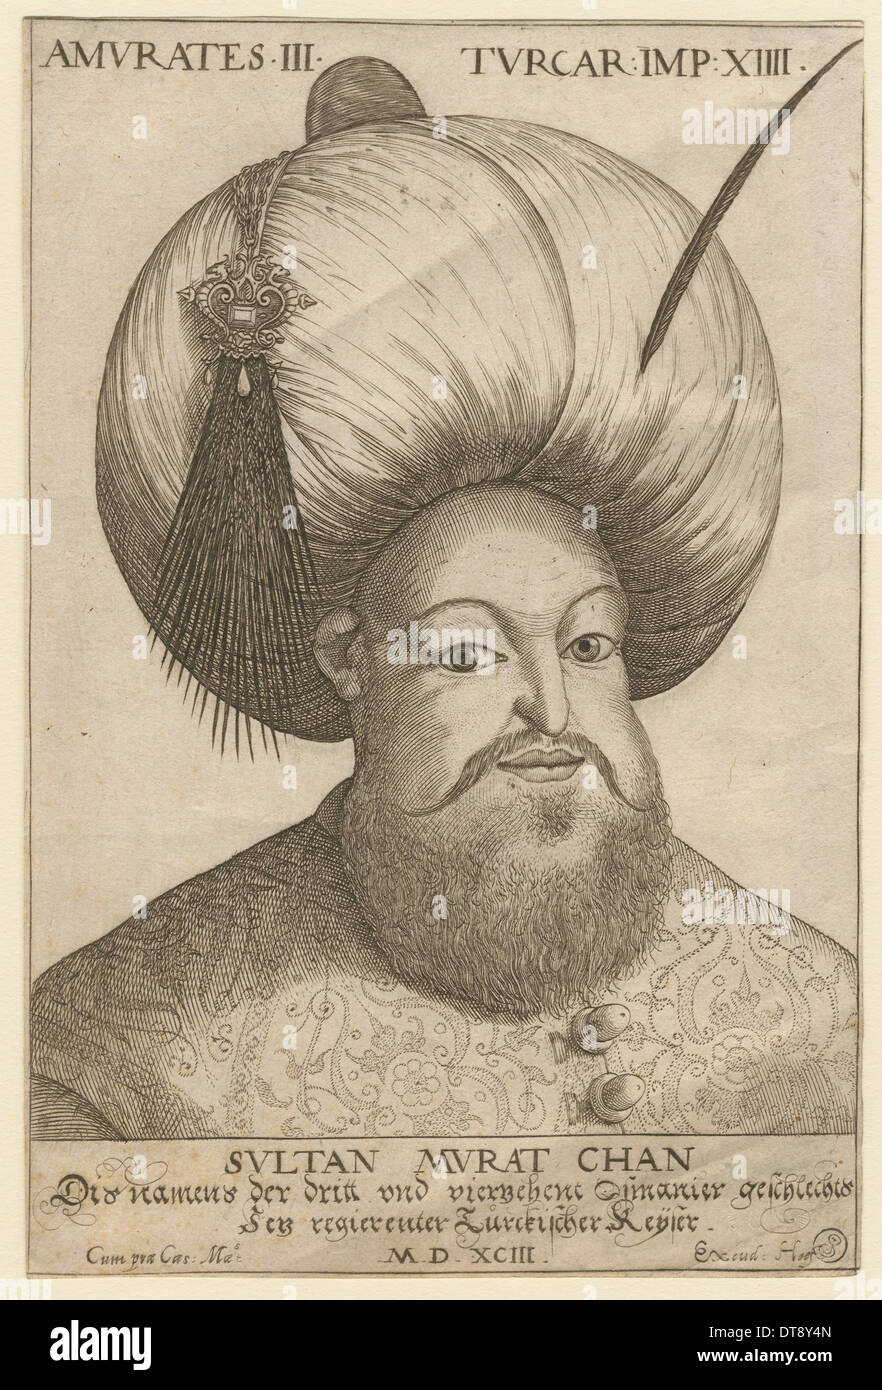 Murad III (1546-1595), Sultan of the Ottoman Empire, 1593. Artist: Anonymous - Stock Image